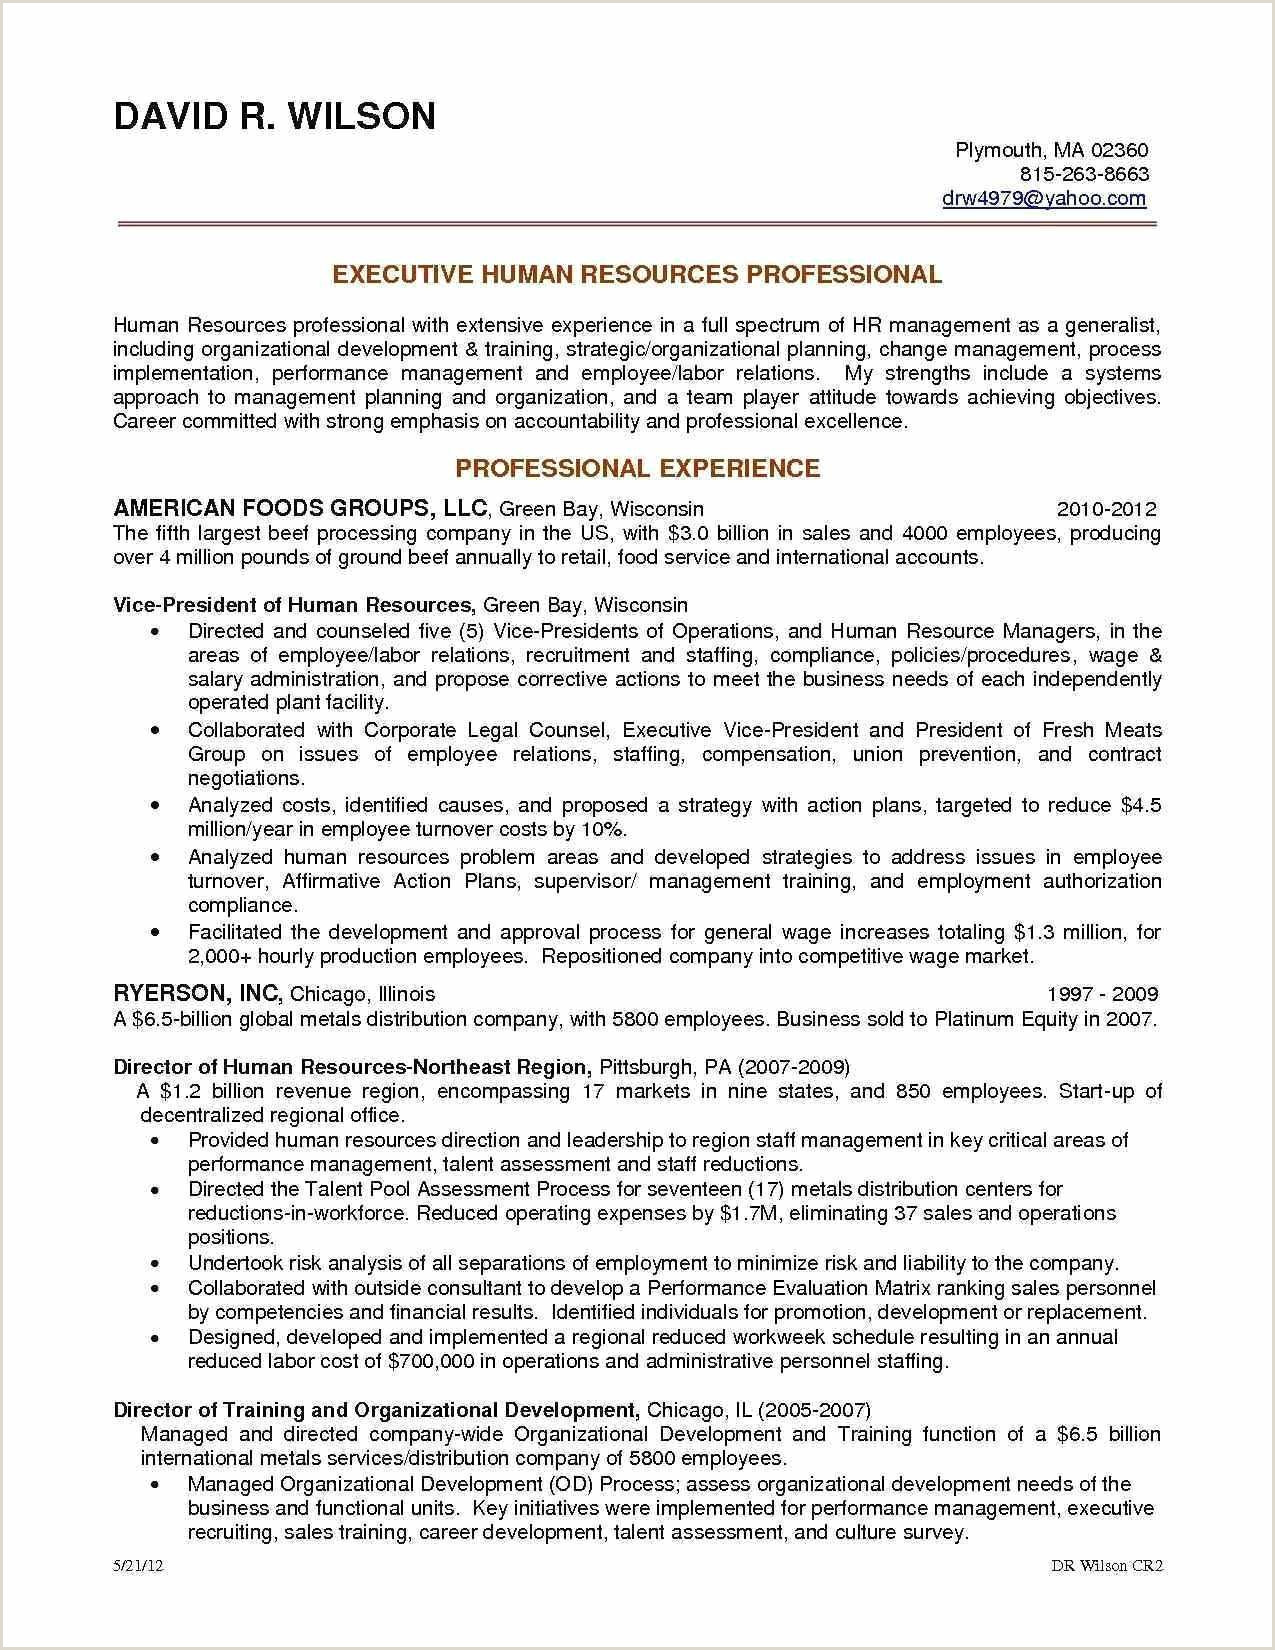 Resume format for No Job Experience Non Experienced Resume Examples sofasdocsurvey